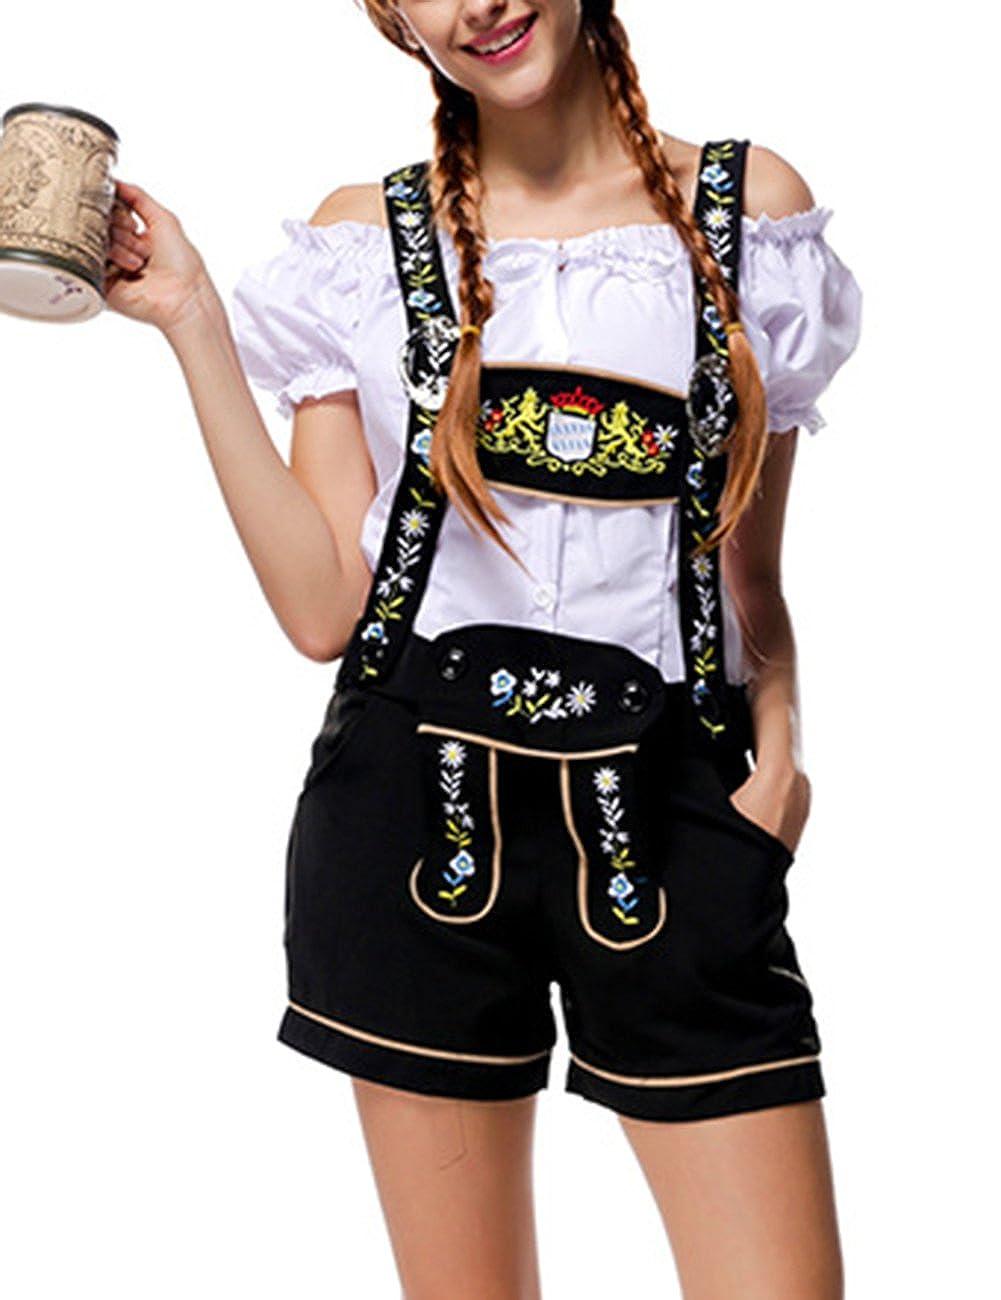 XUBA Traje Camiseta Camisa Pantalones de Tirantes Cl/ásico Sexcy de Cuadro de Oktoberfest Cerveza Tradicional de Cosplay Manga Corta Mujeres Camarero de Sirve Negro Blanco L